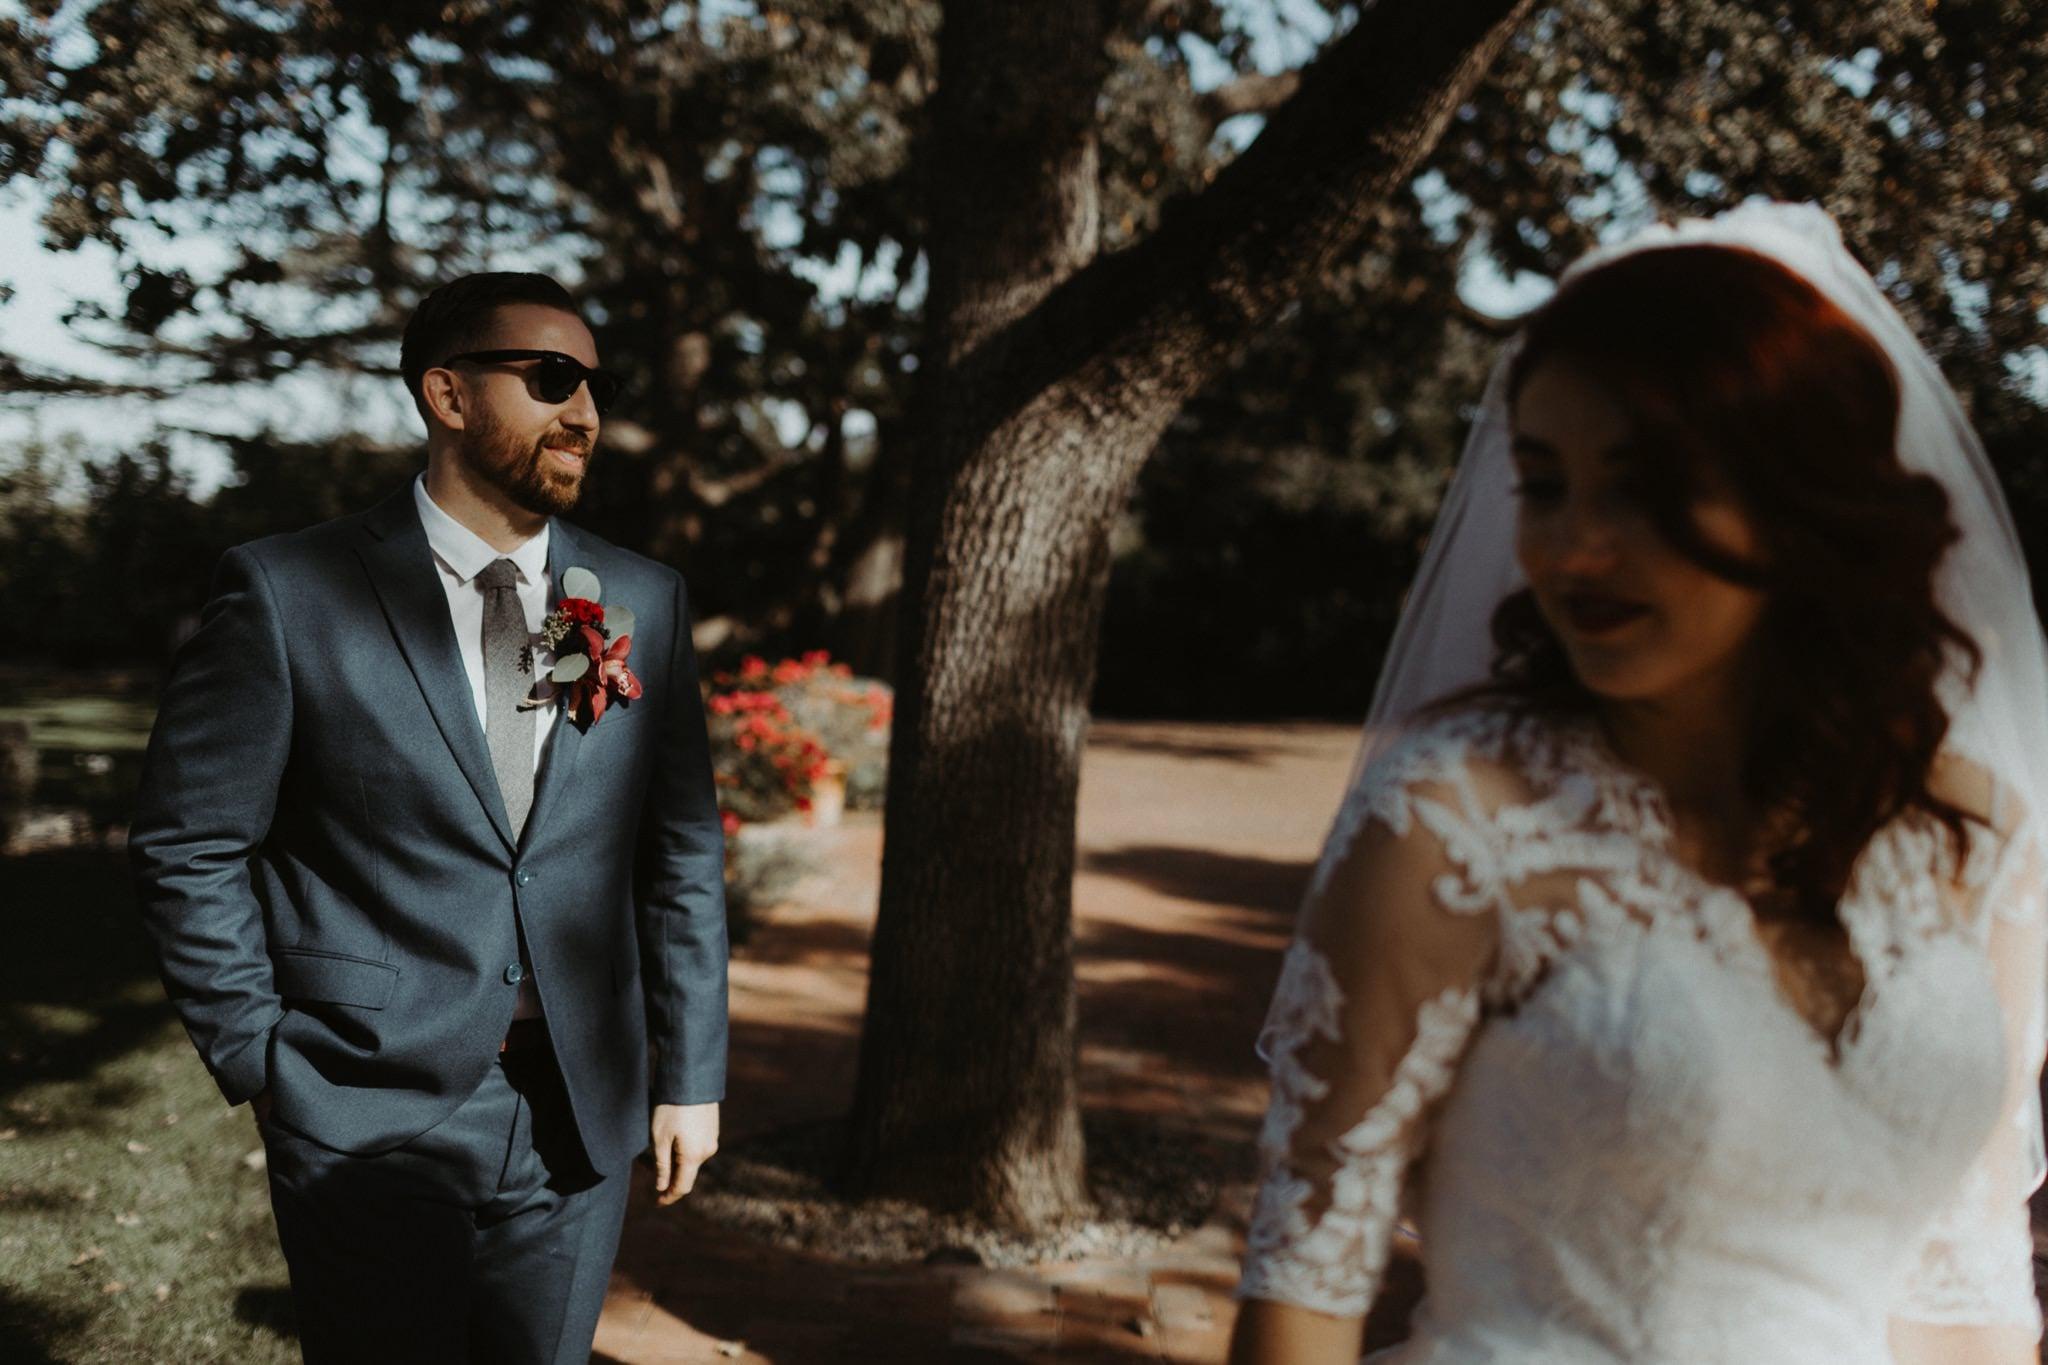 simi valley wedding photography 057